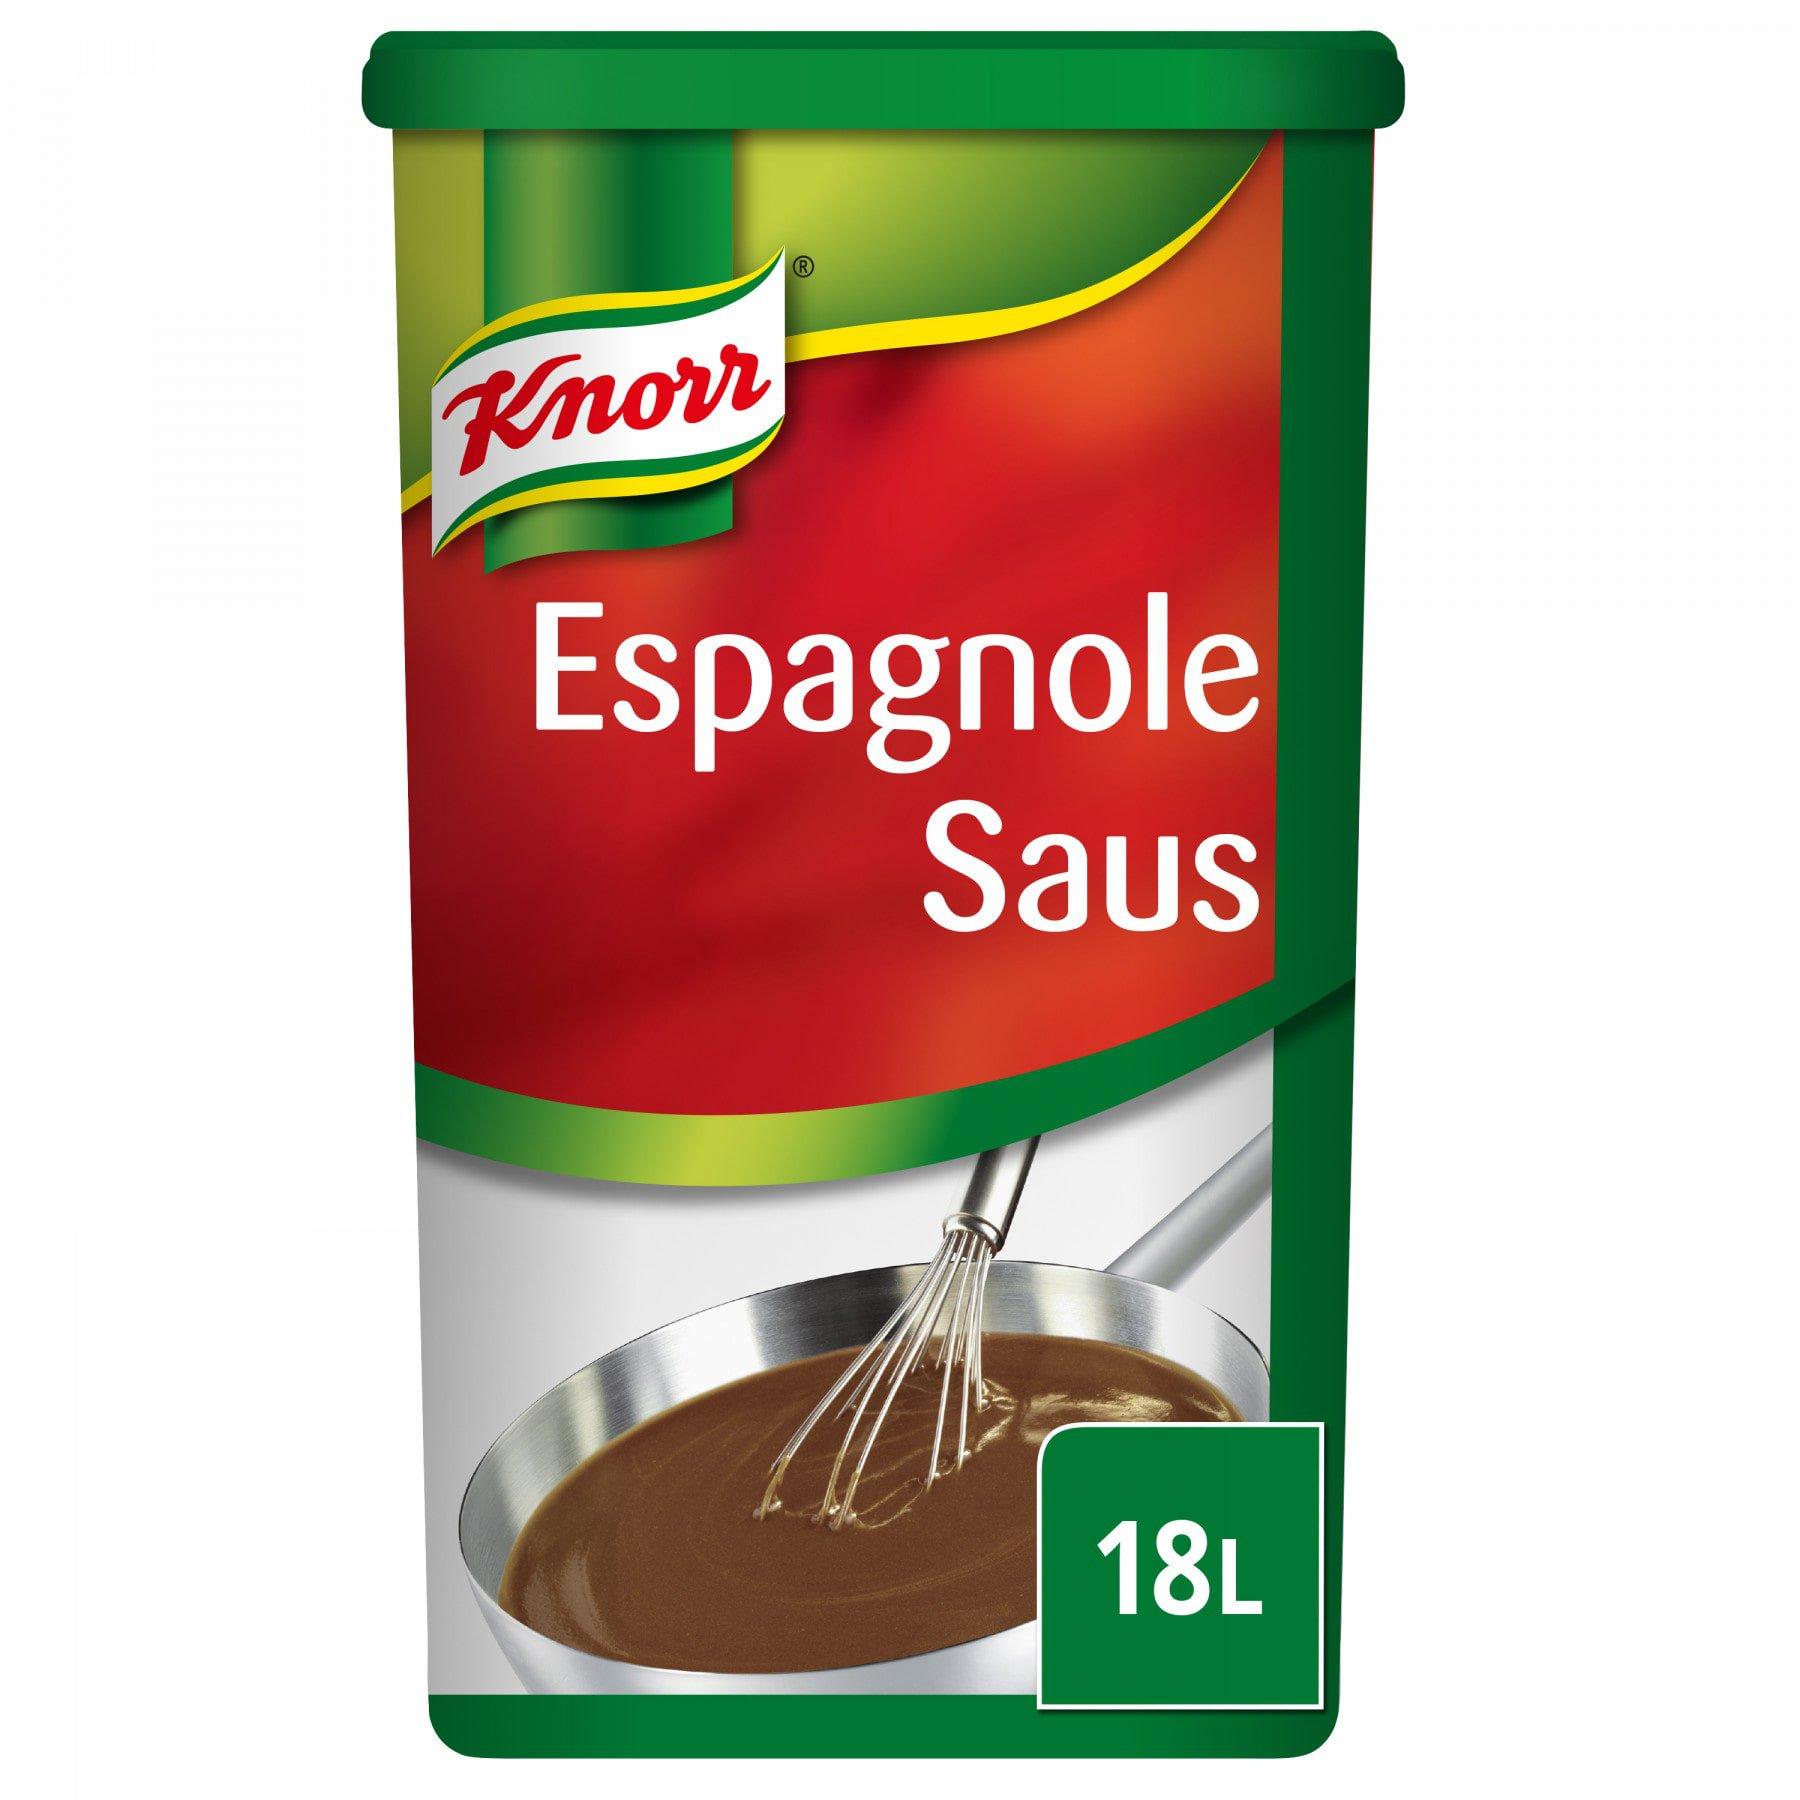 Knorr | Espagnole saus | 18 liter